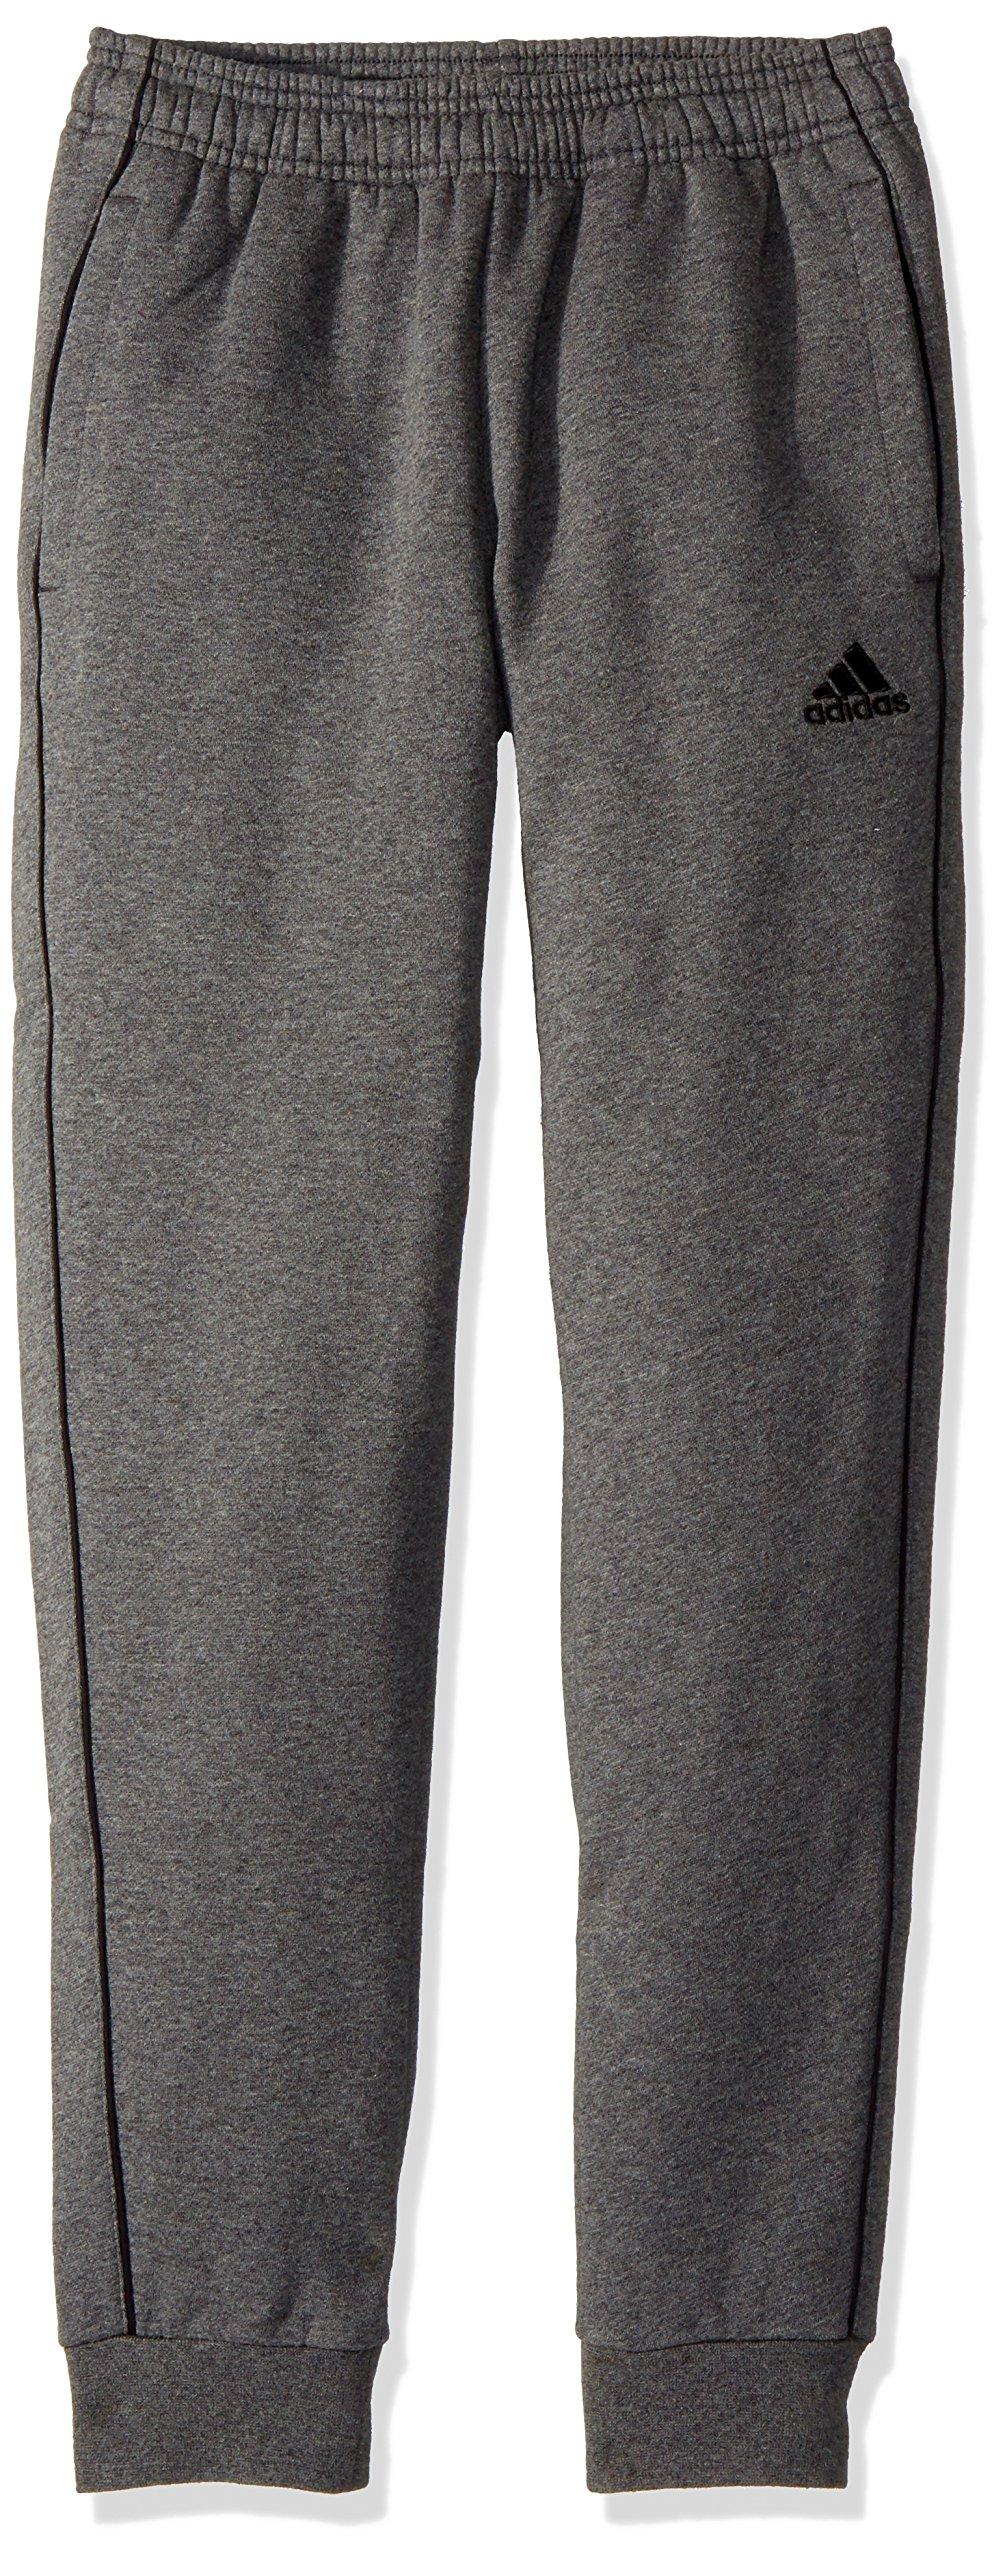 adidas Core 18 Sweat Pants, Dark Grey Heather/Black, 2XS by adidas